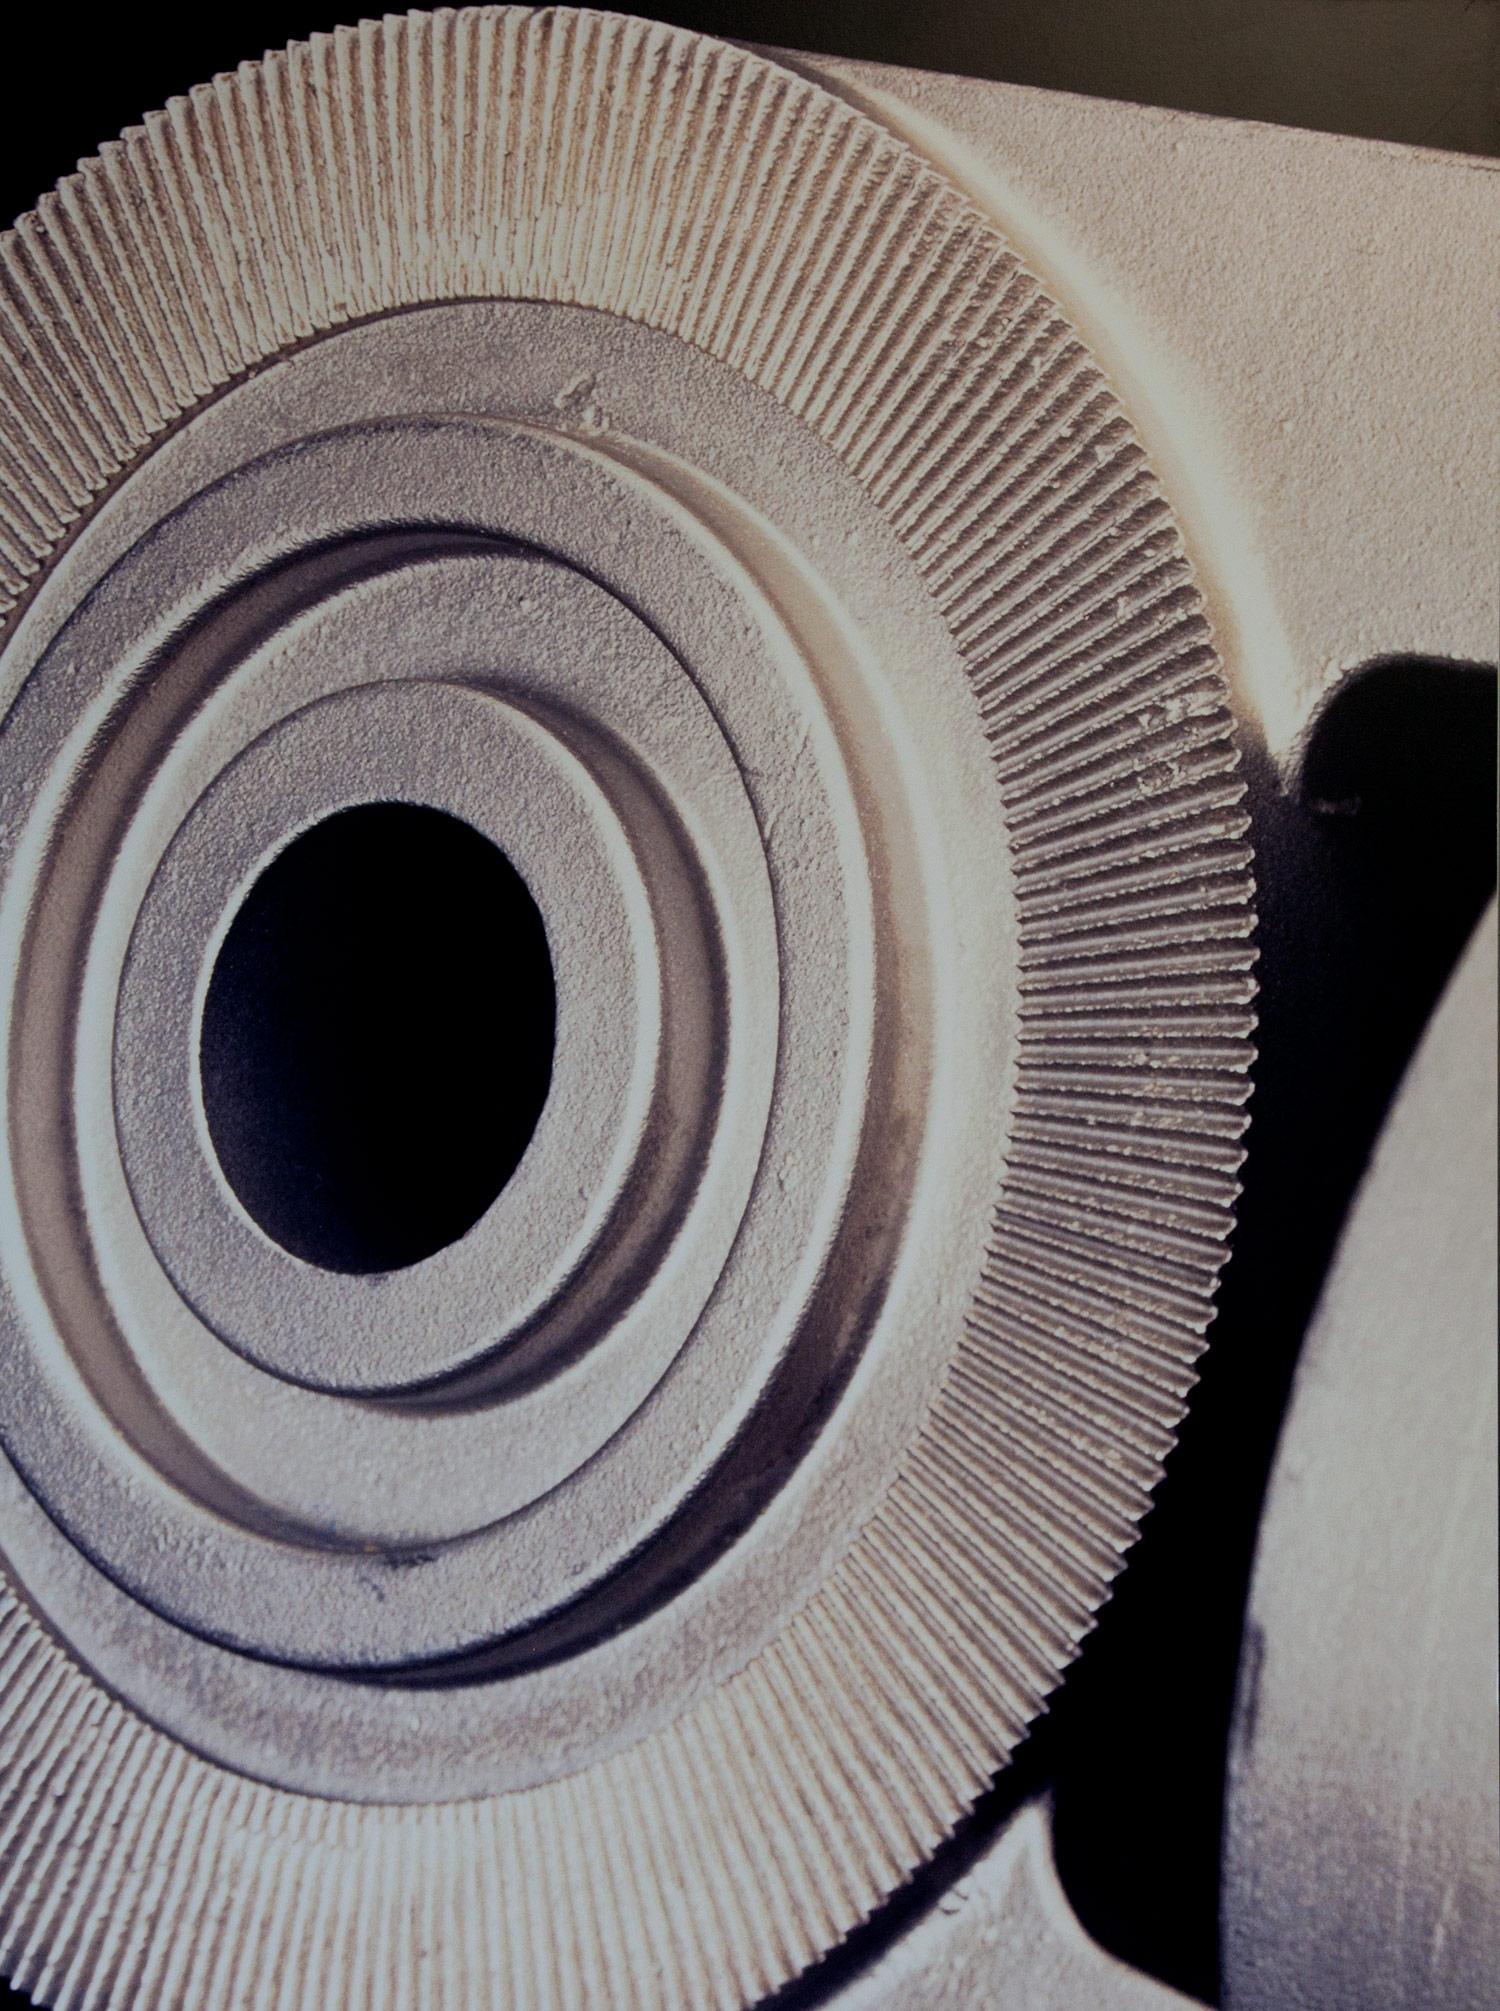 © 1995 Peter Ströbel